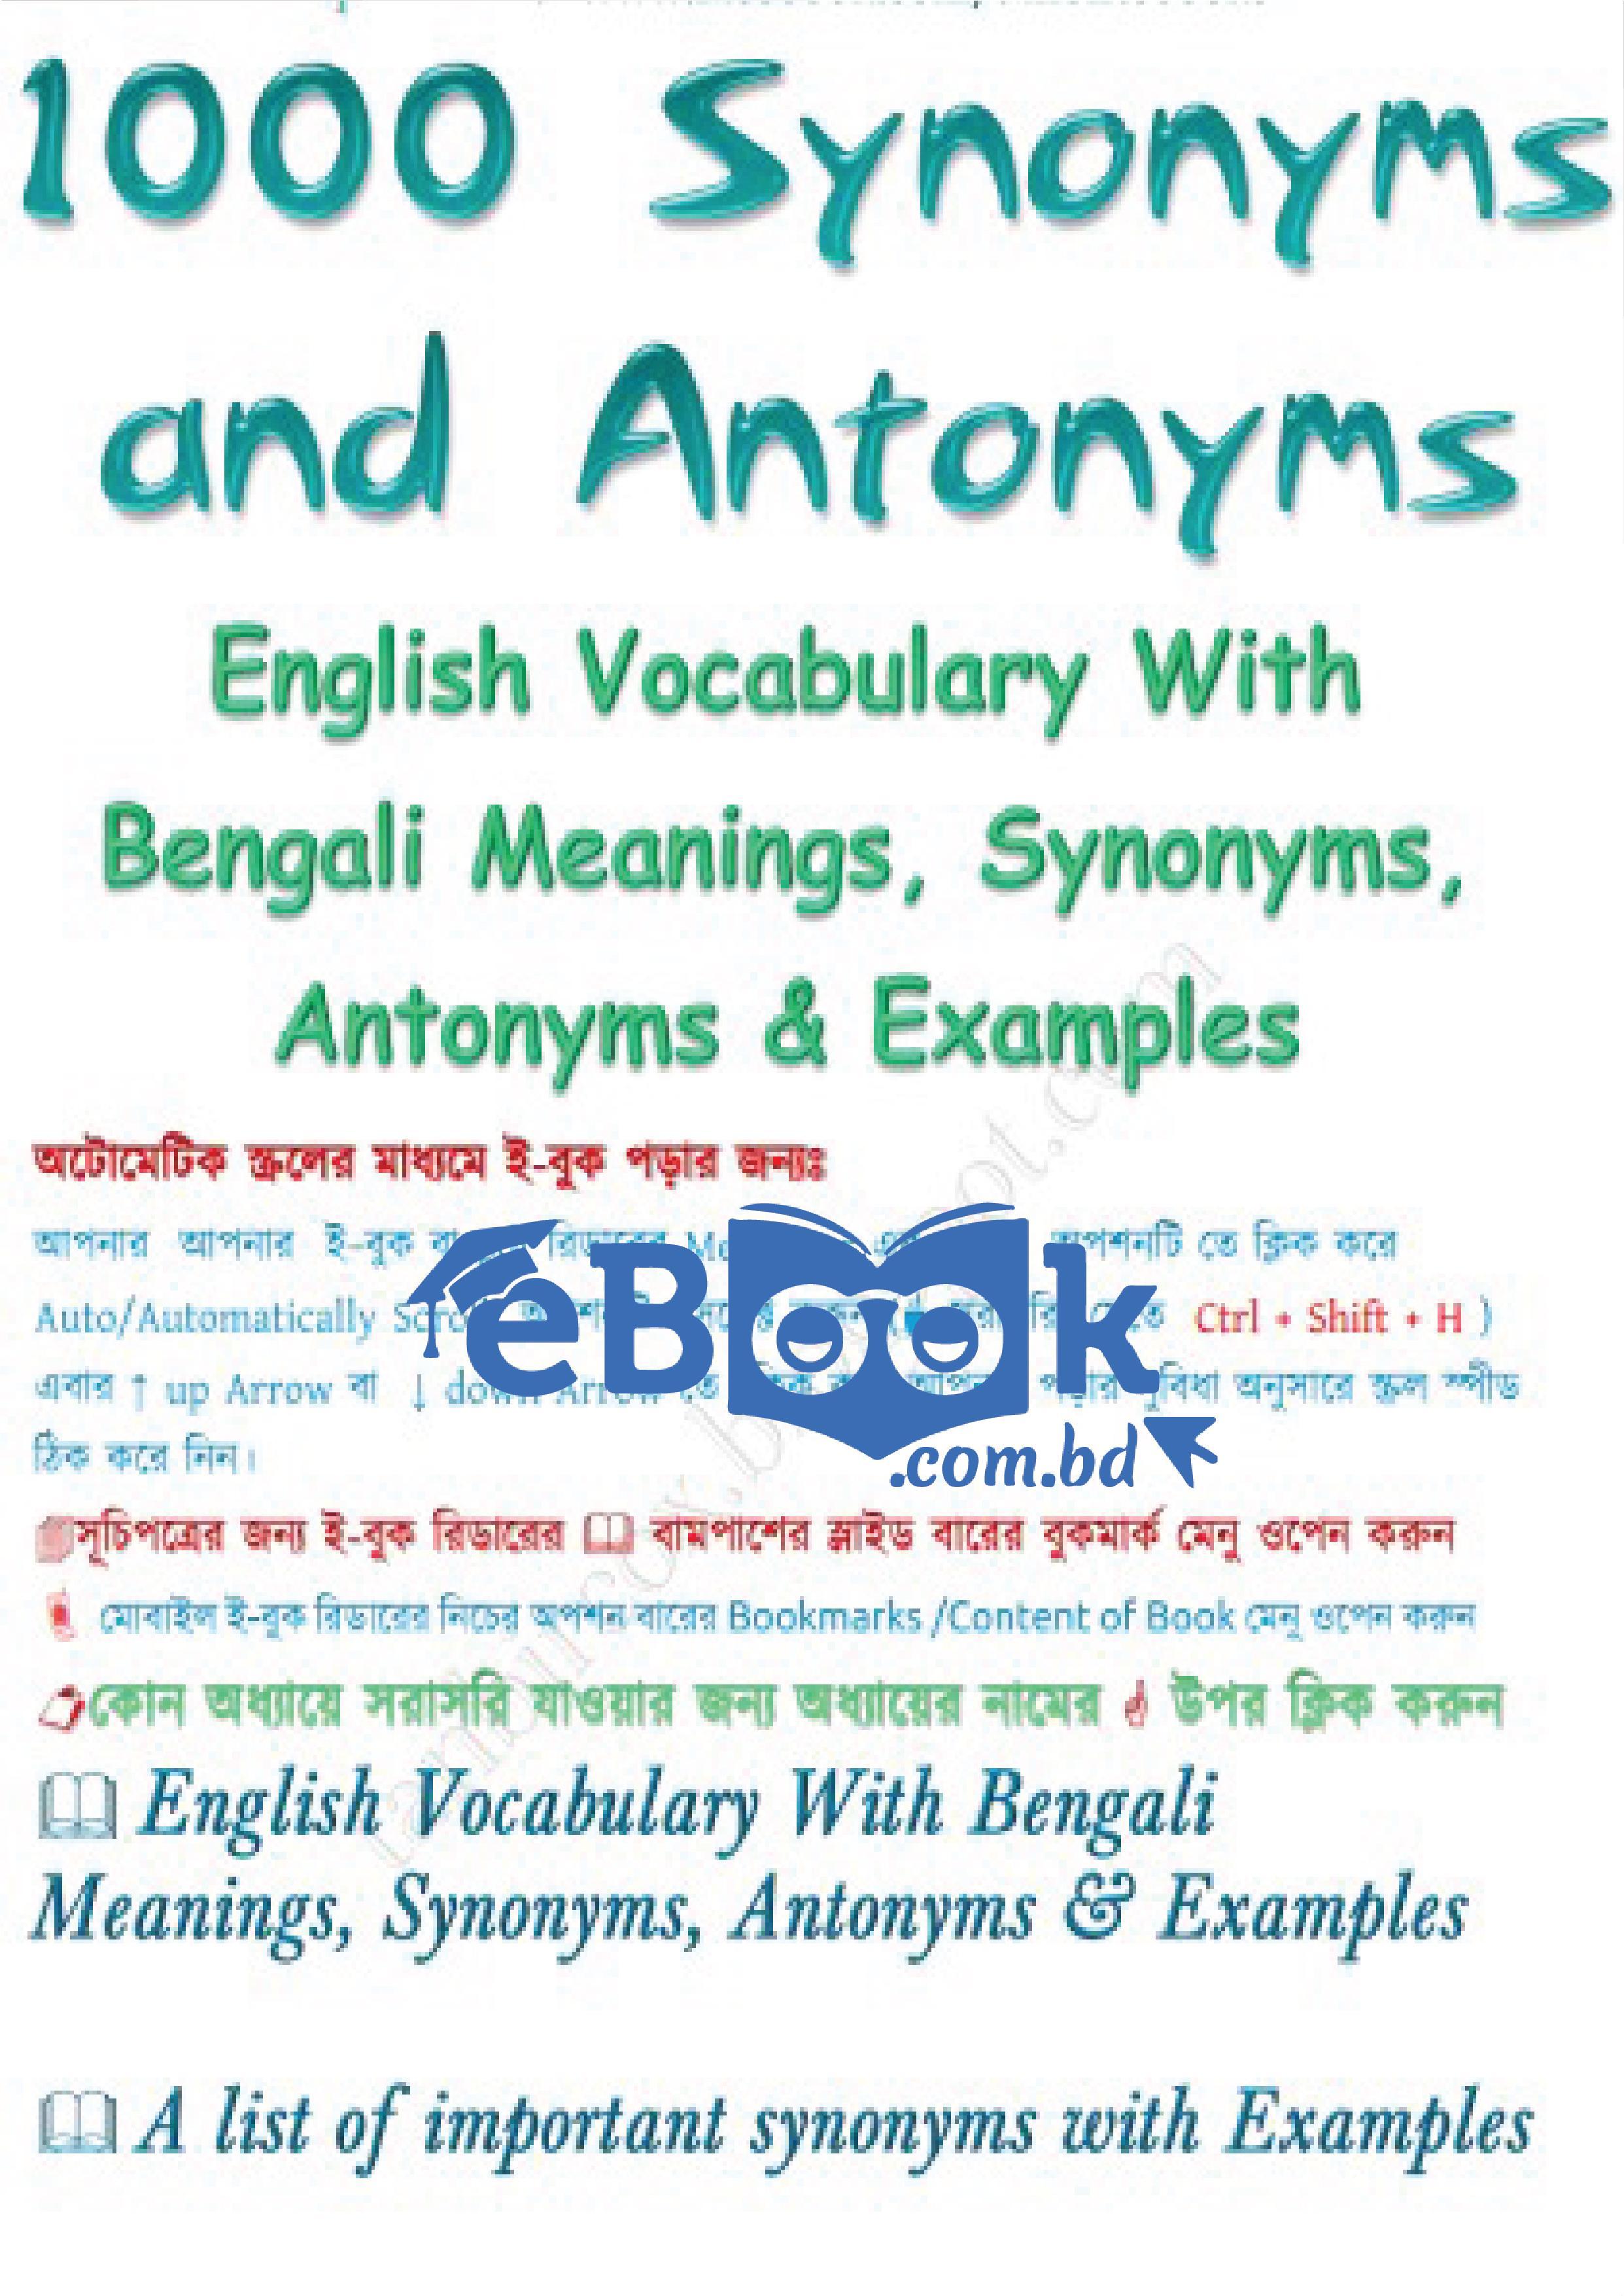 1000 Synonyms and Antonyms - ১০০০ সমার্থক এবং বিপরীতার্থক শব্দ